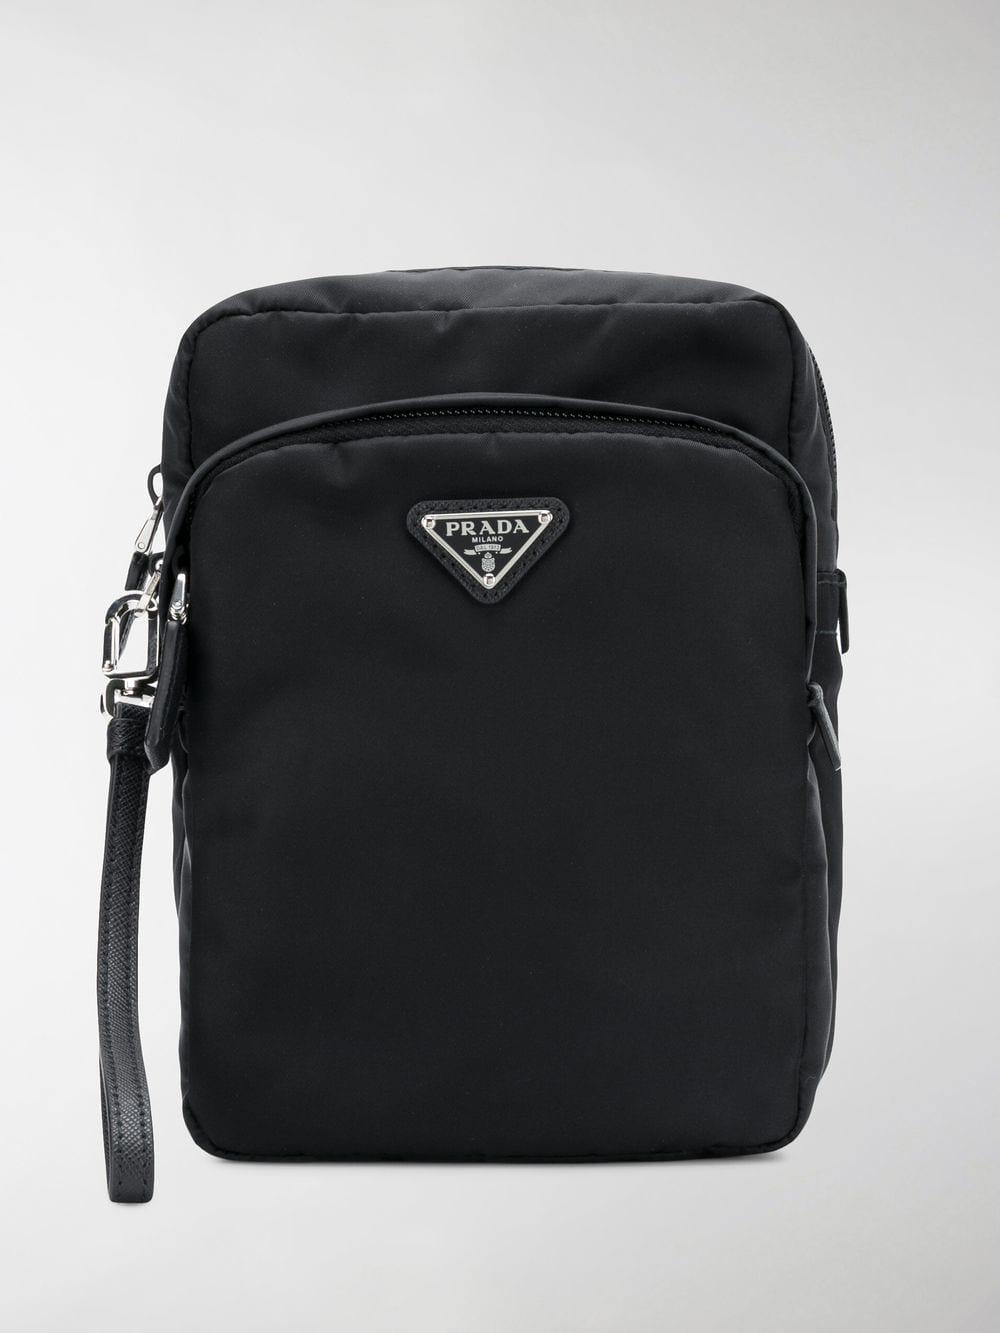 20e53a7887b6 sweden prada black saffiano messenger bag for men lyst. view fullscreen  1f58d 3d427